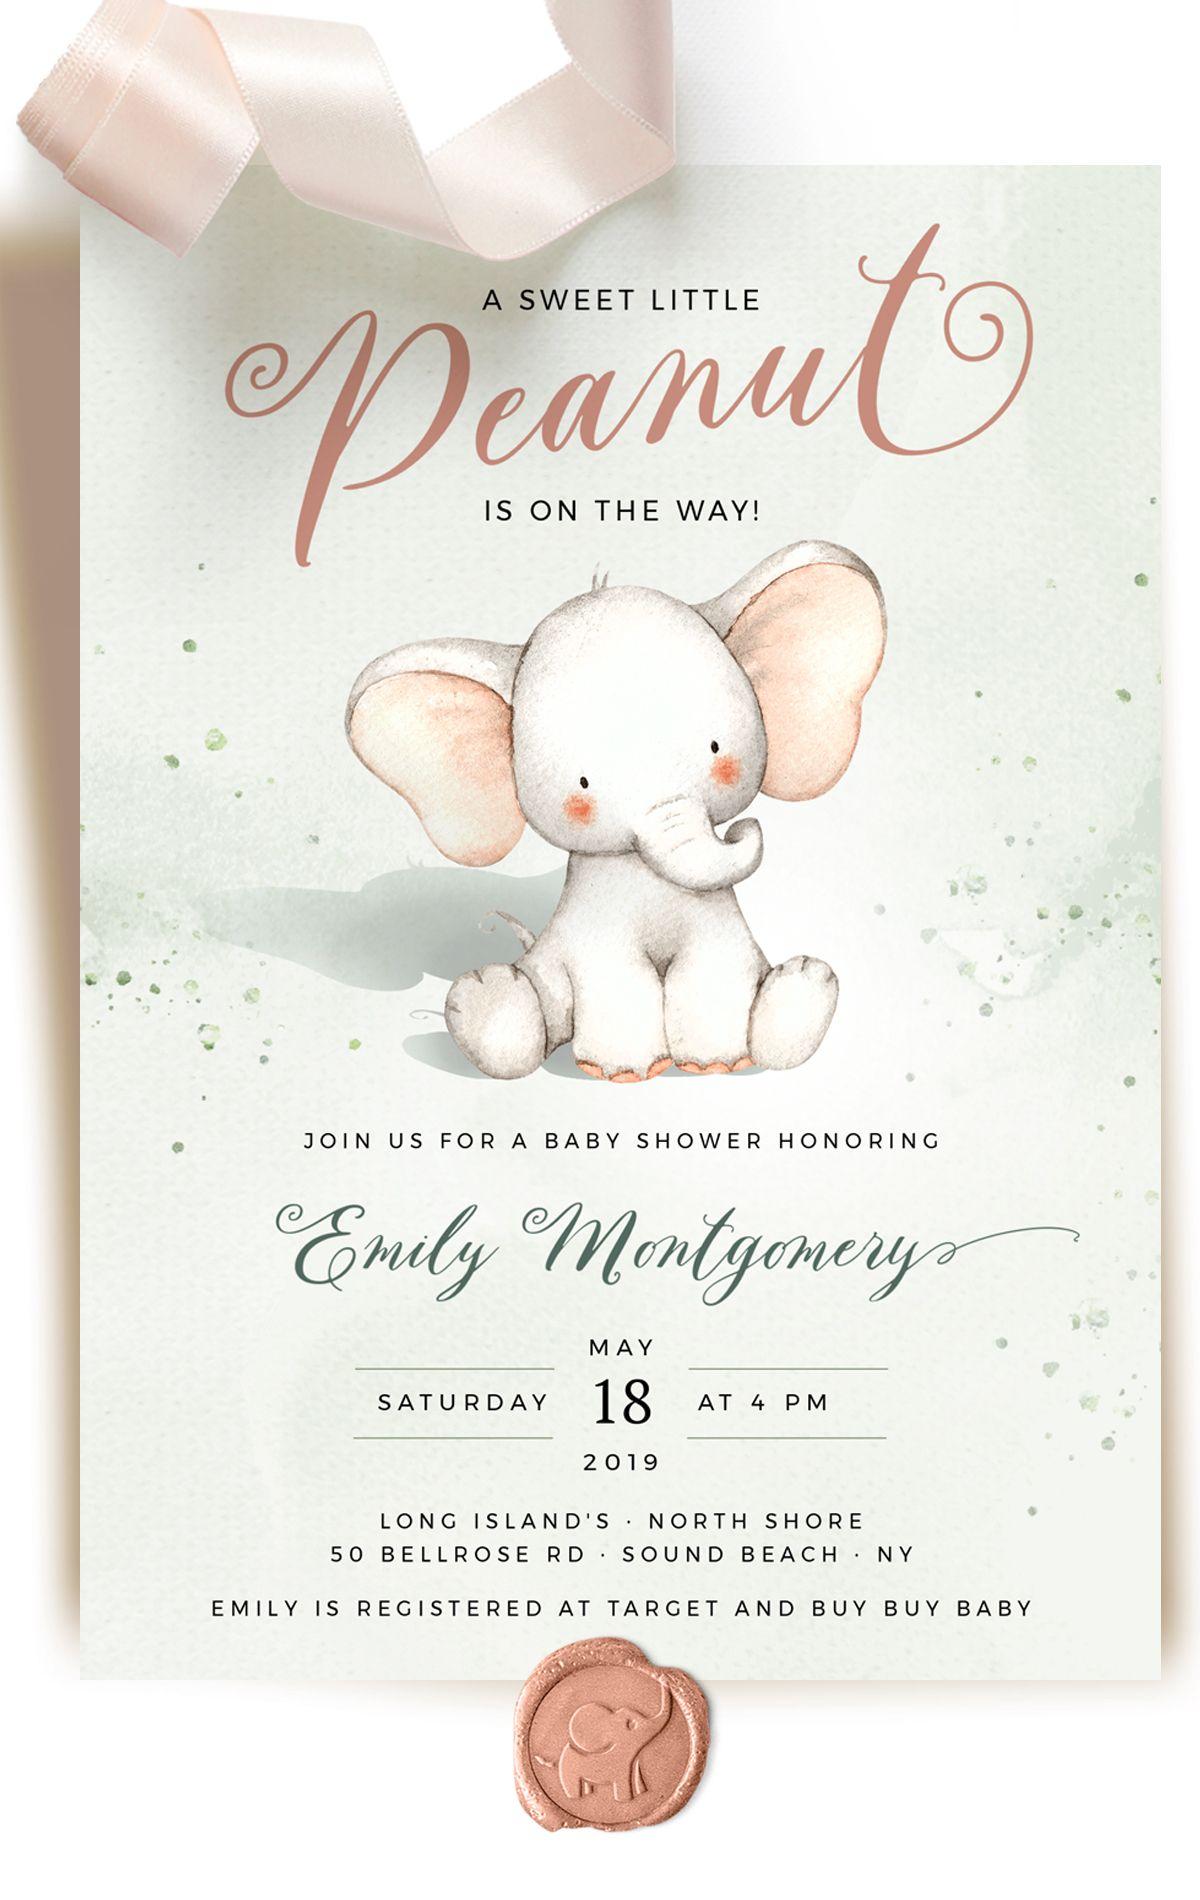 Peanut Elephant Baby Shower Invitation Template Dumbo Baby Party